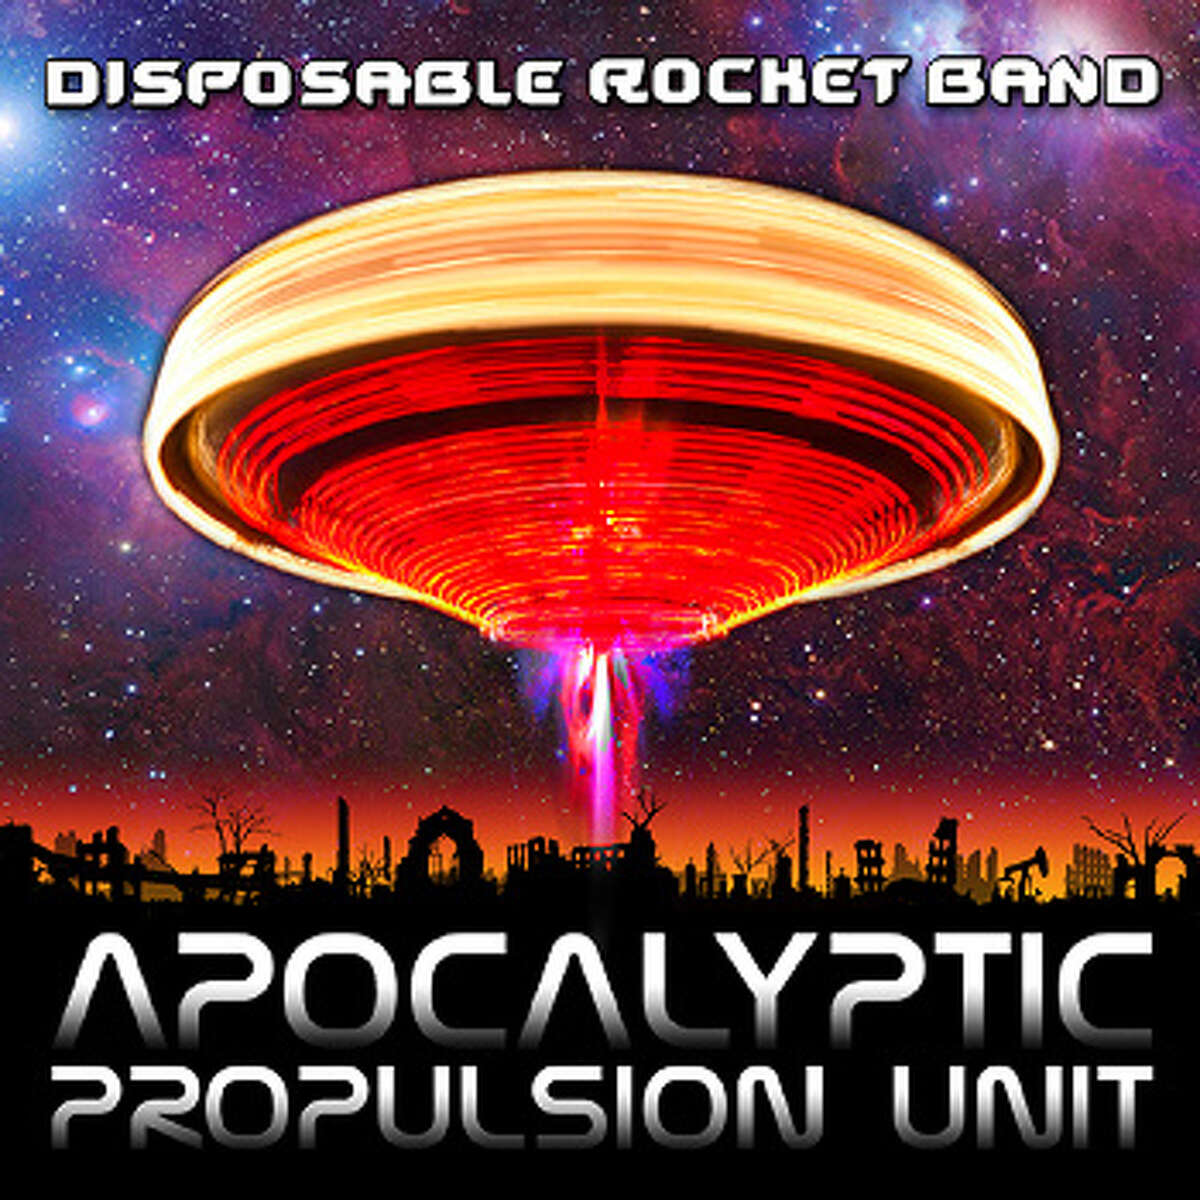 Apocalyptic Propulsion Unit